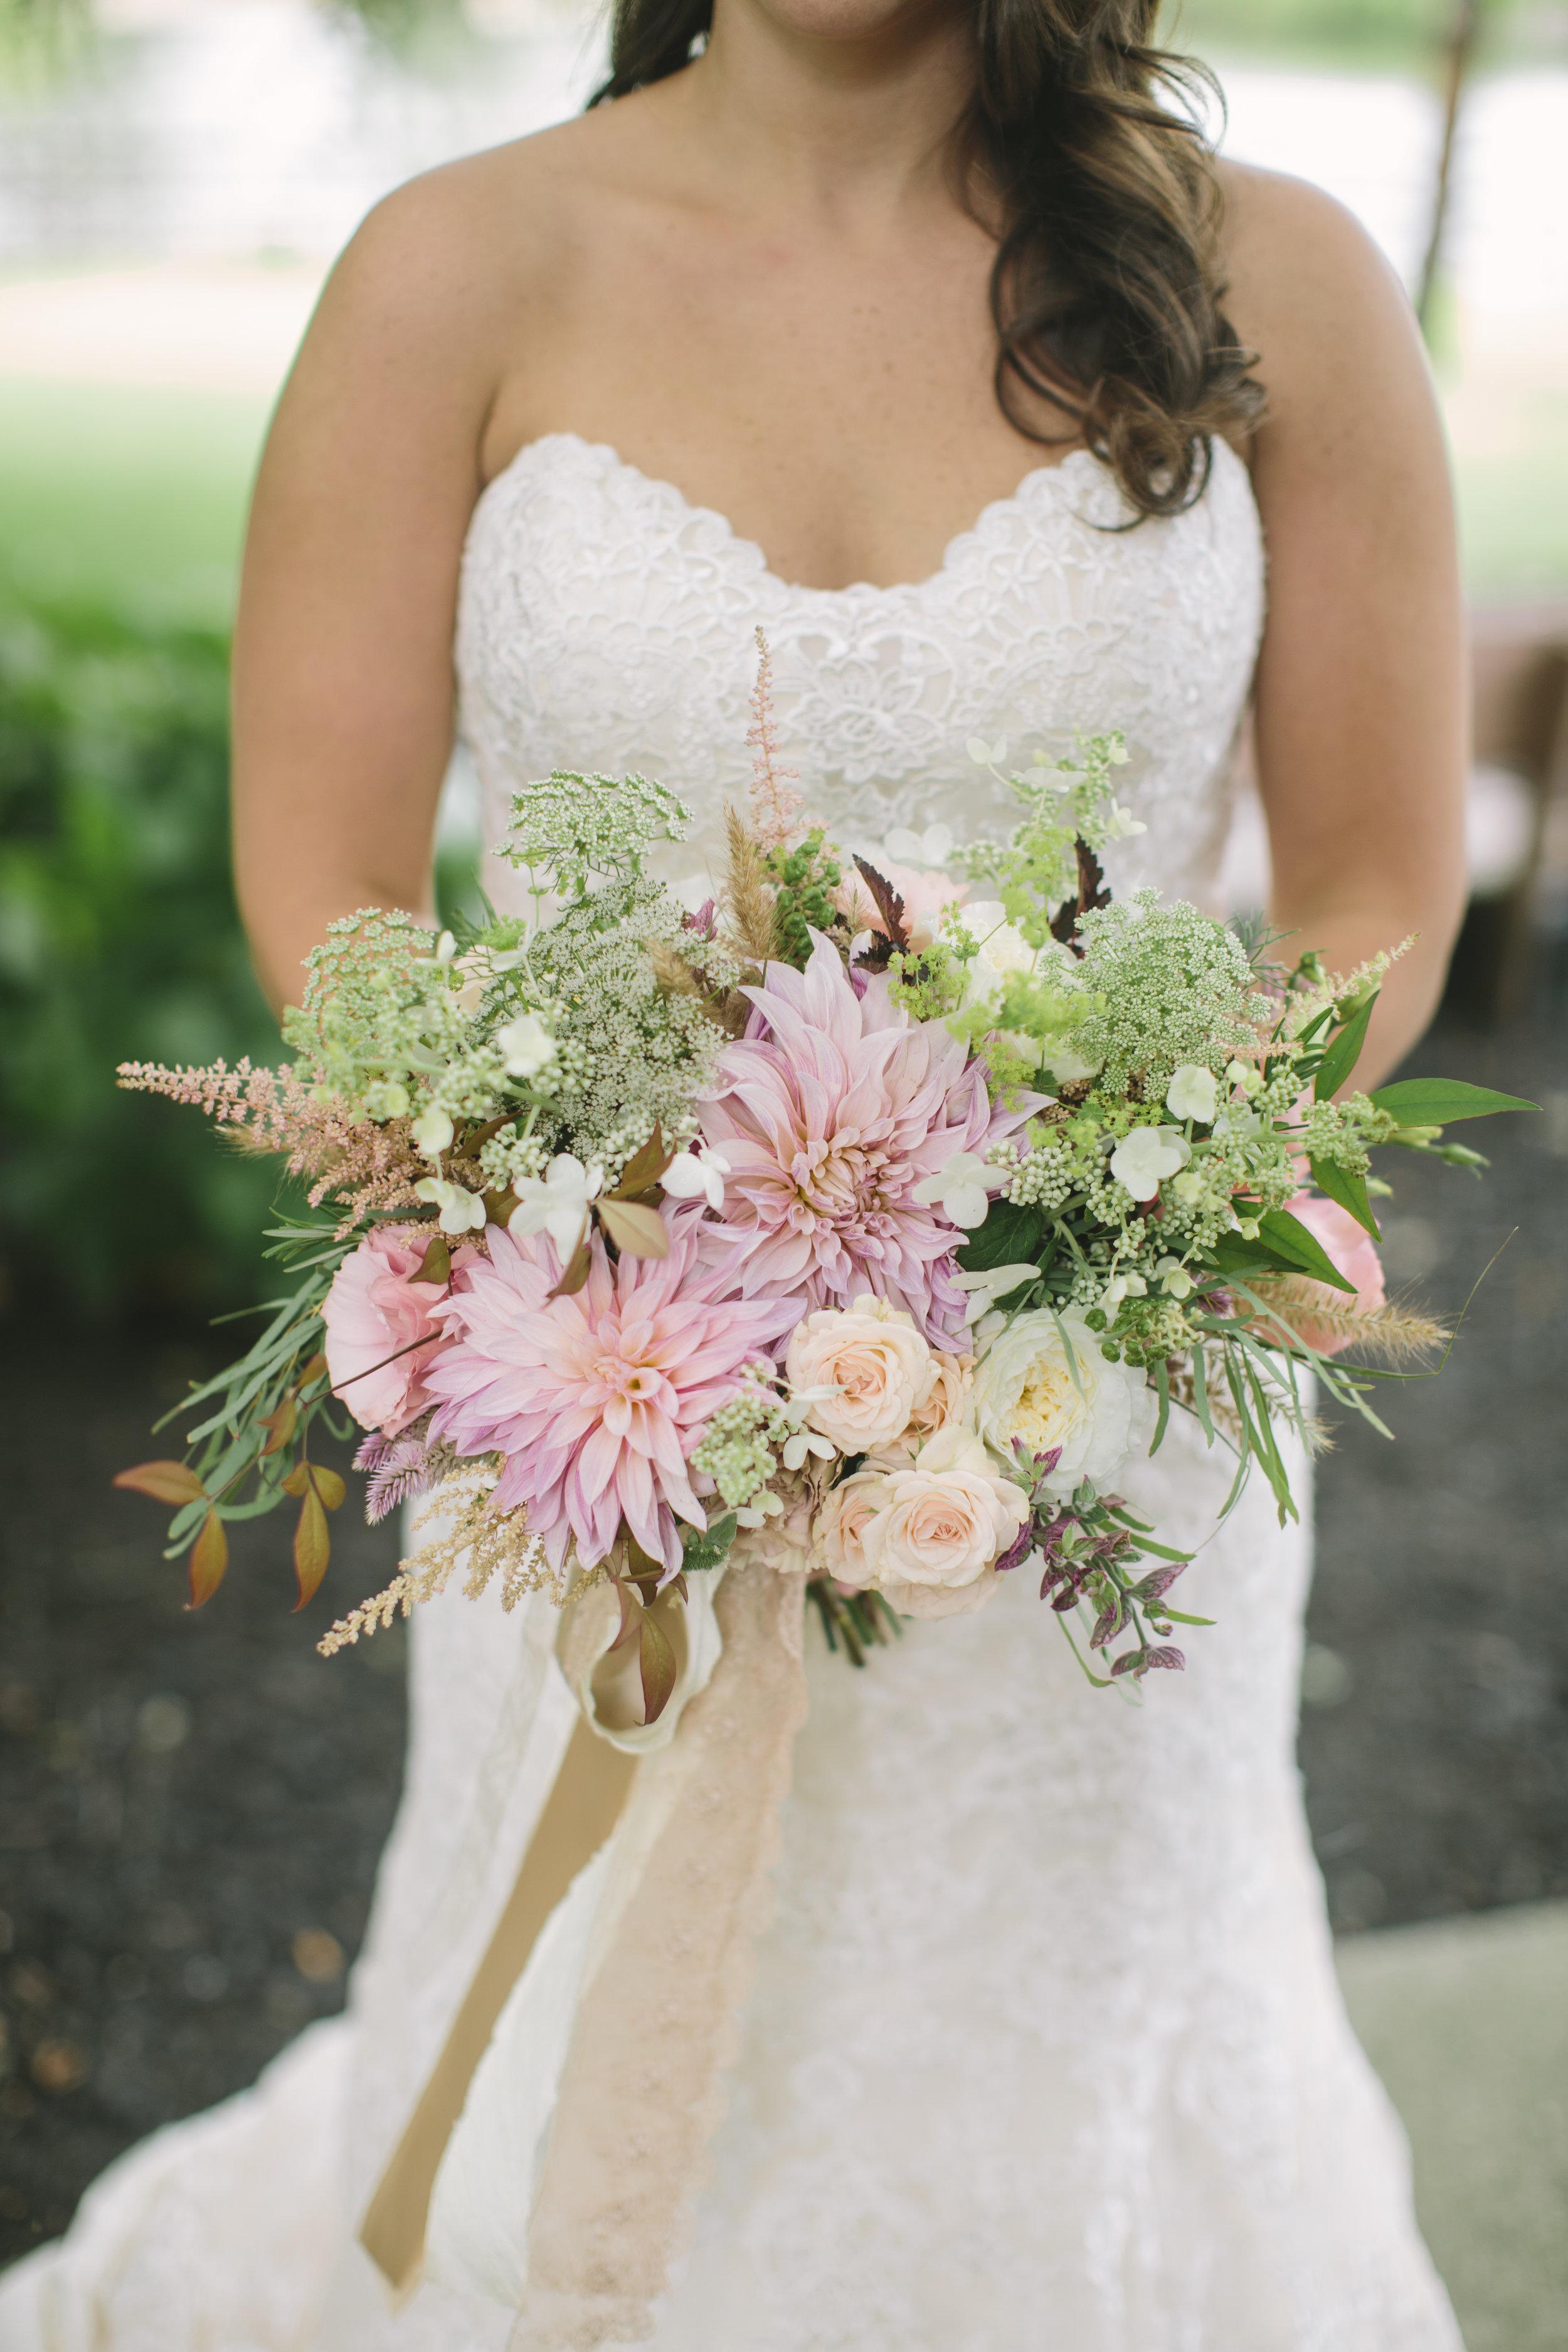 Smithville Inn Wedding, Bride Bouquet, Blush and White Bouquet, Salt Water Studios